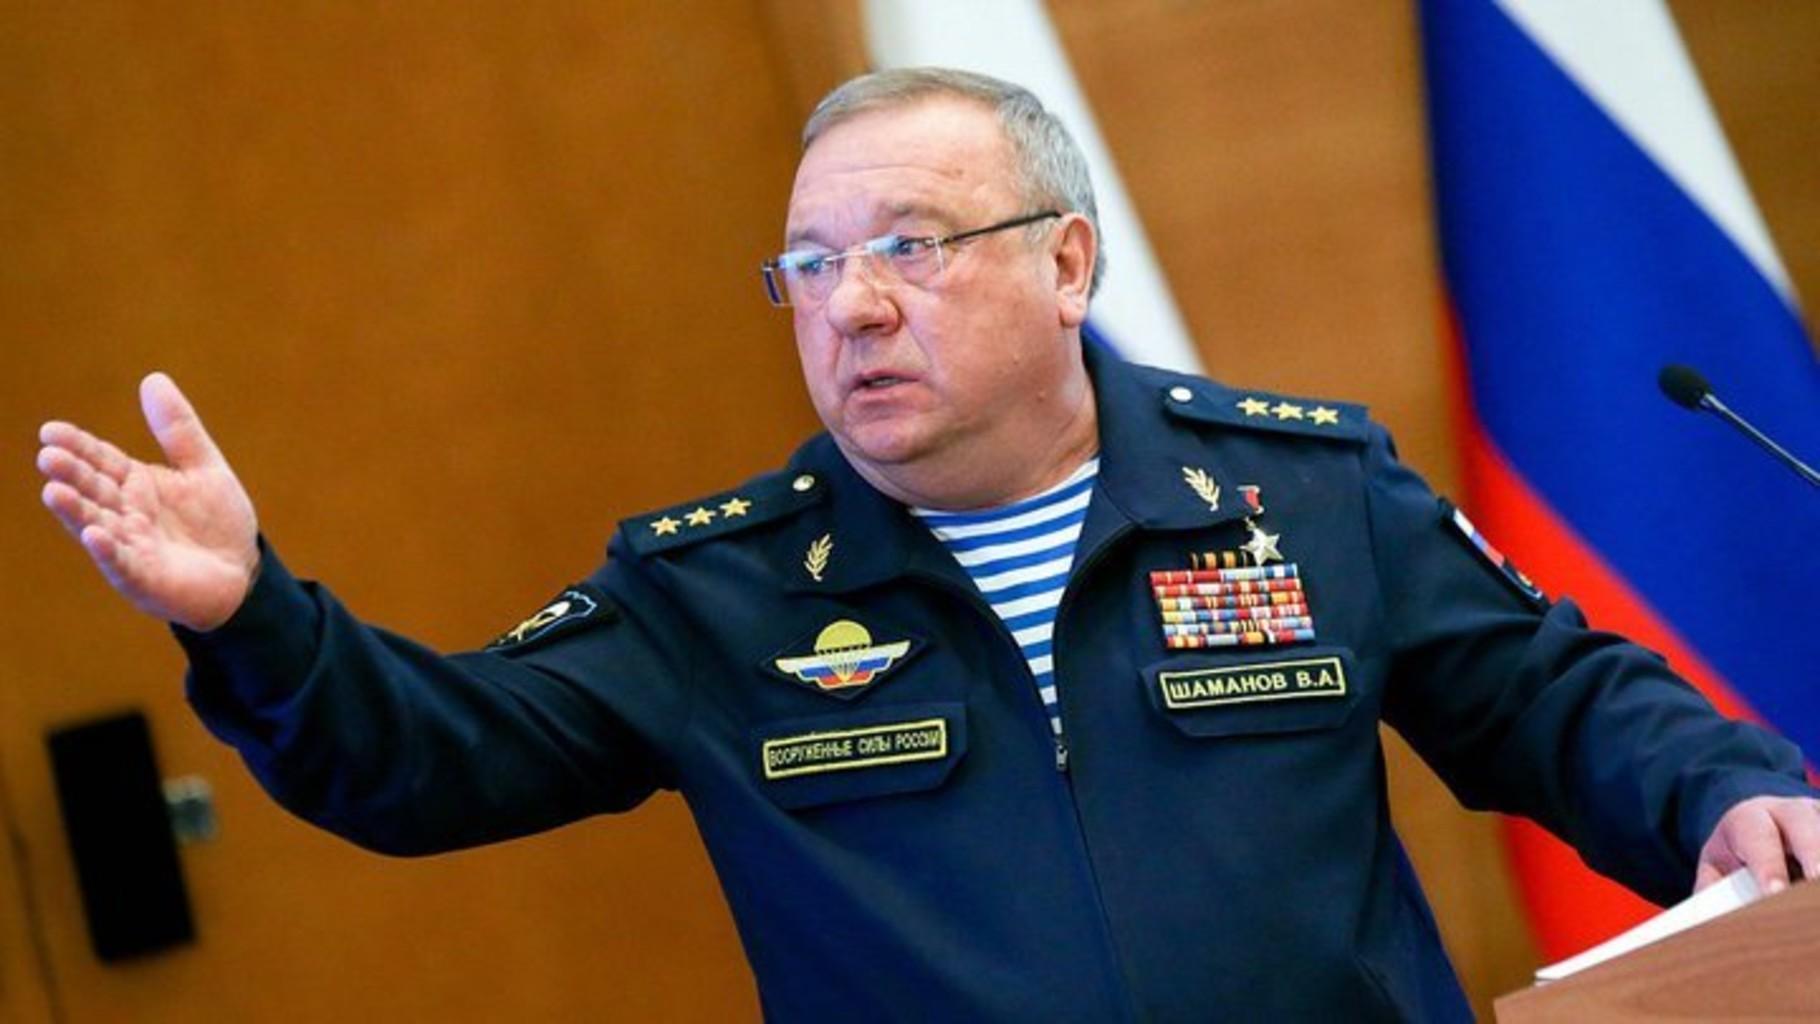 Владимир Шаманов, фото: сайт Госдумы РФ